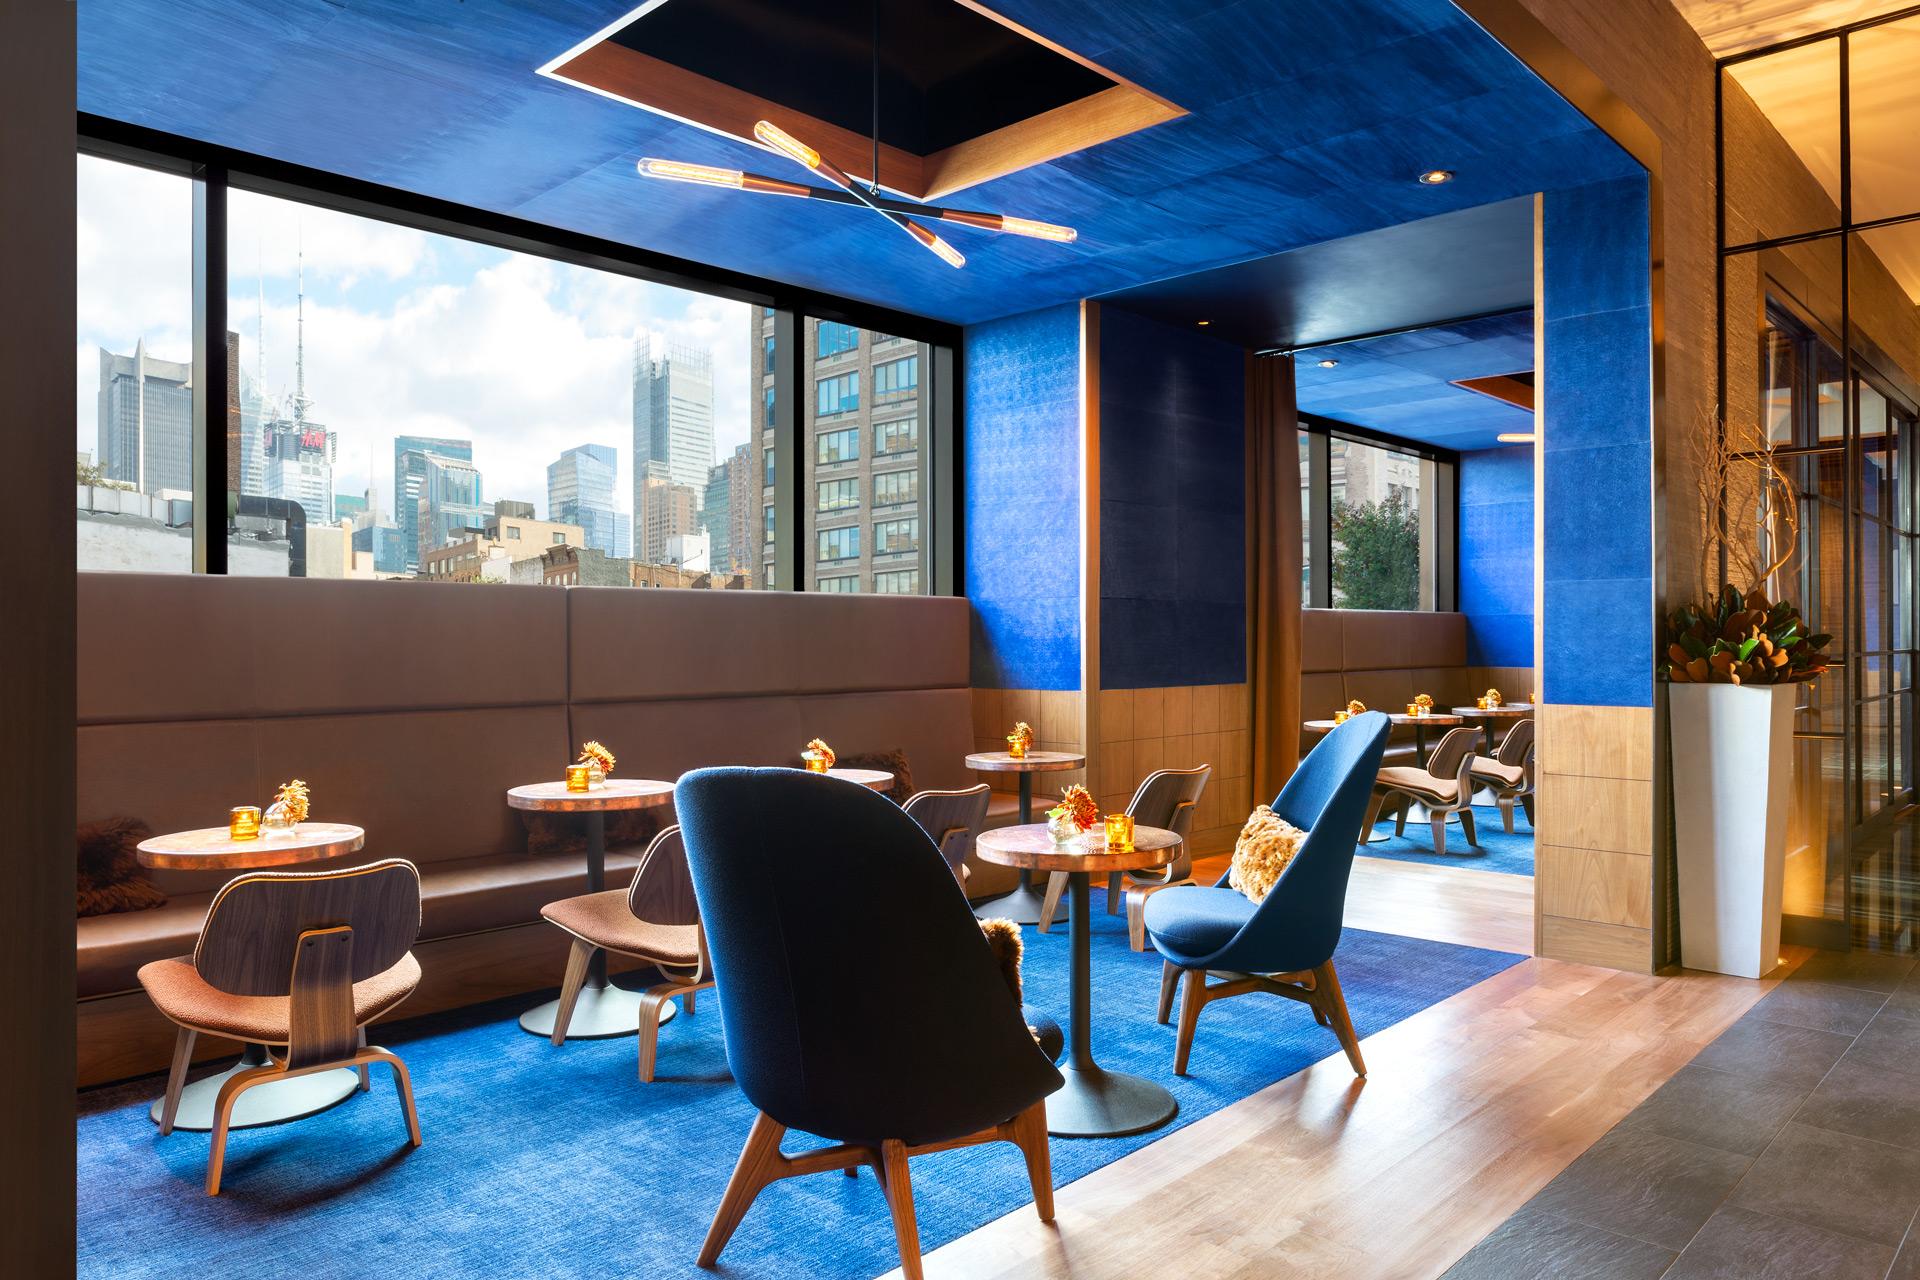 Print Lounge restaurant interiors